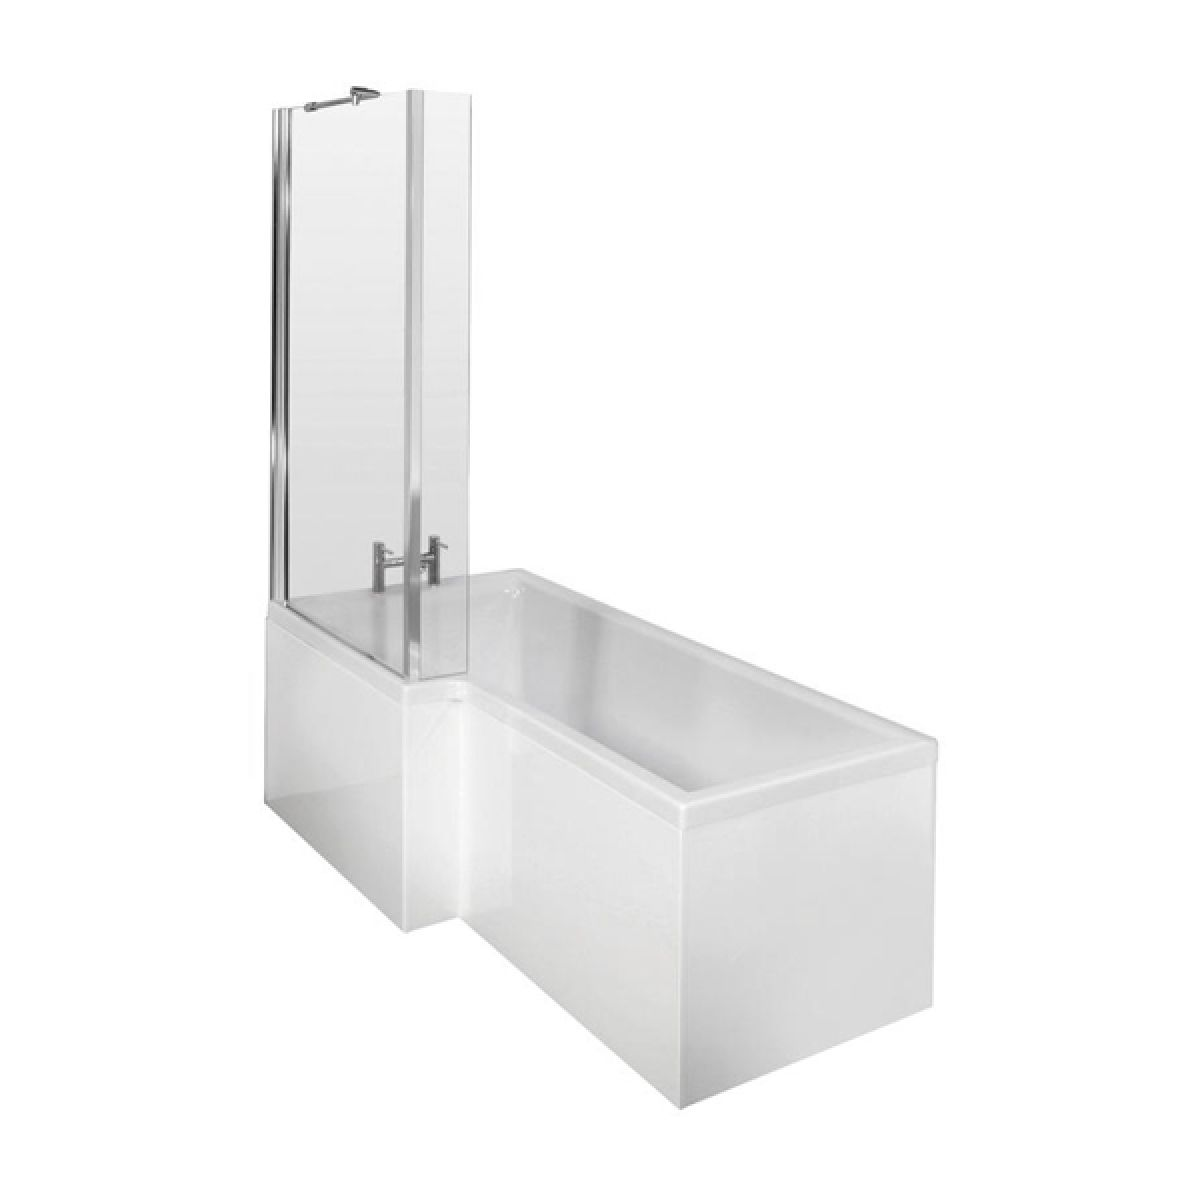 Niko L Shaped Left Hand Shower Bath 1700 x 700mm